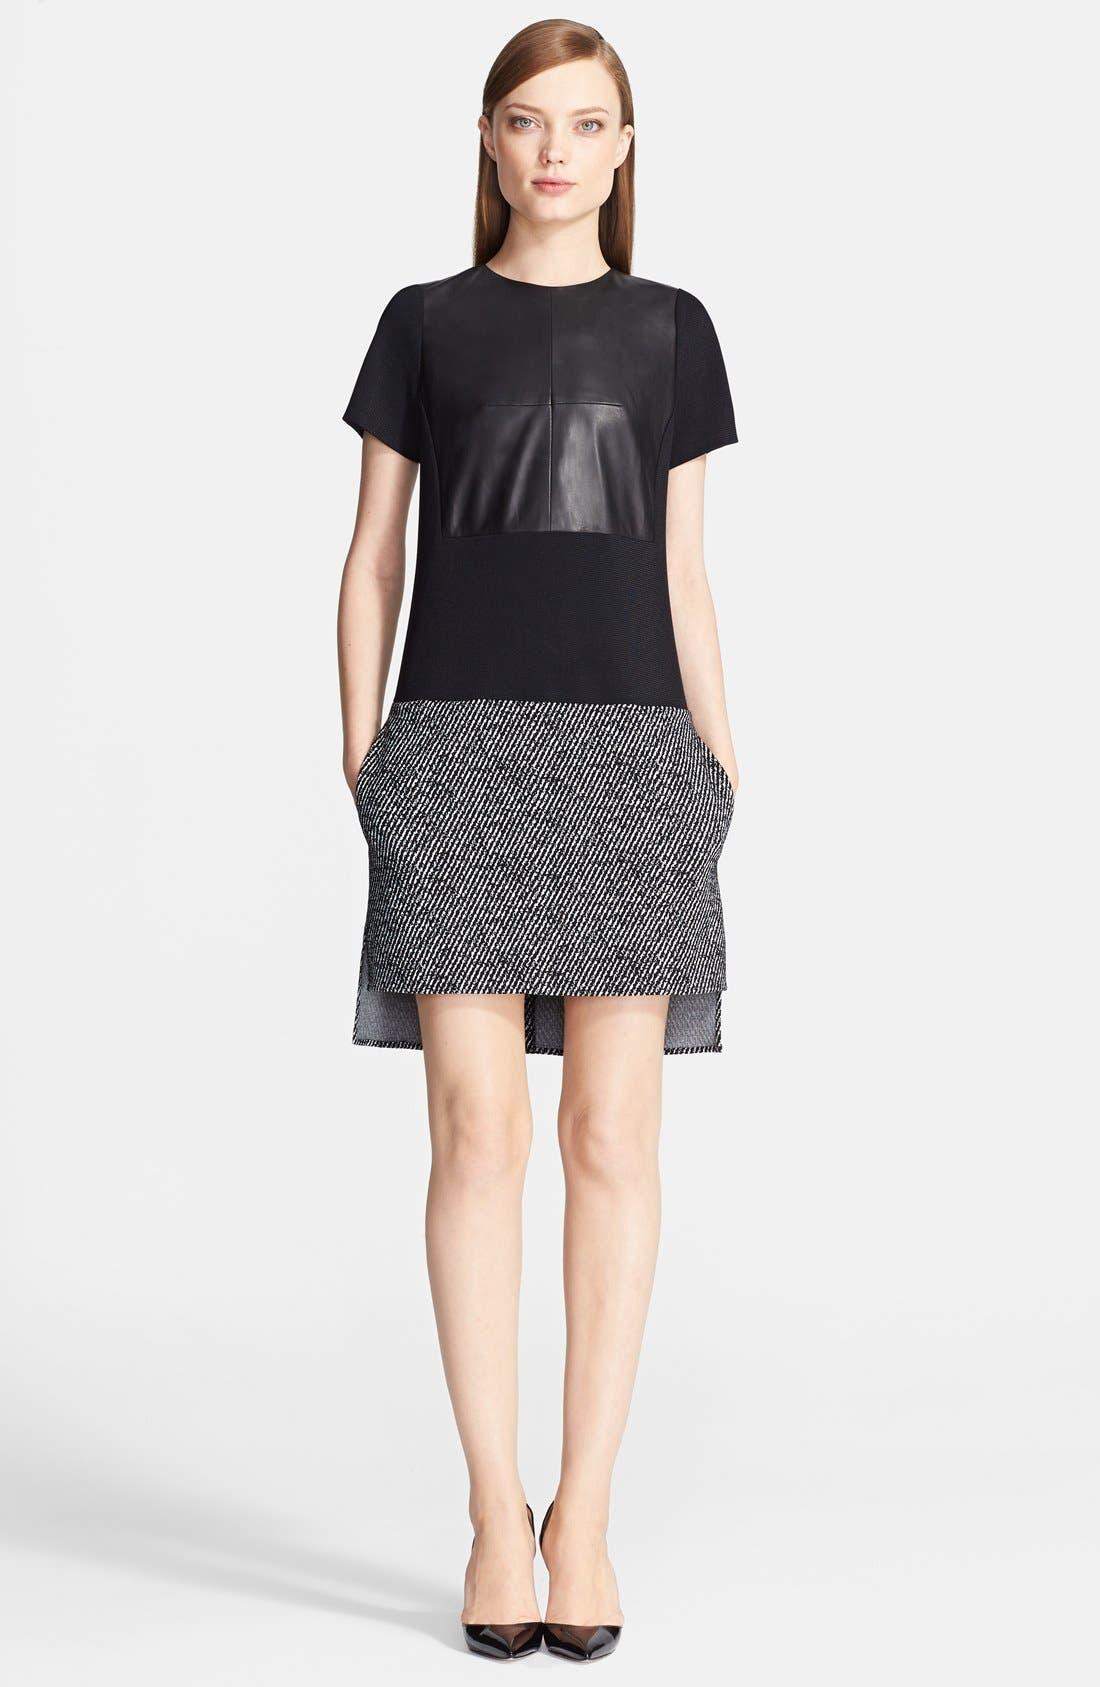 Alternate Image 1 Selected - Prabal Gurung Short Sleeve Leather Panel Knit Dress